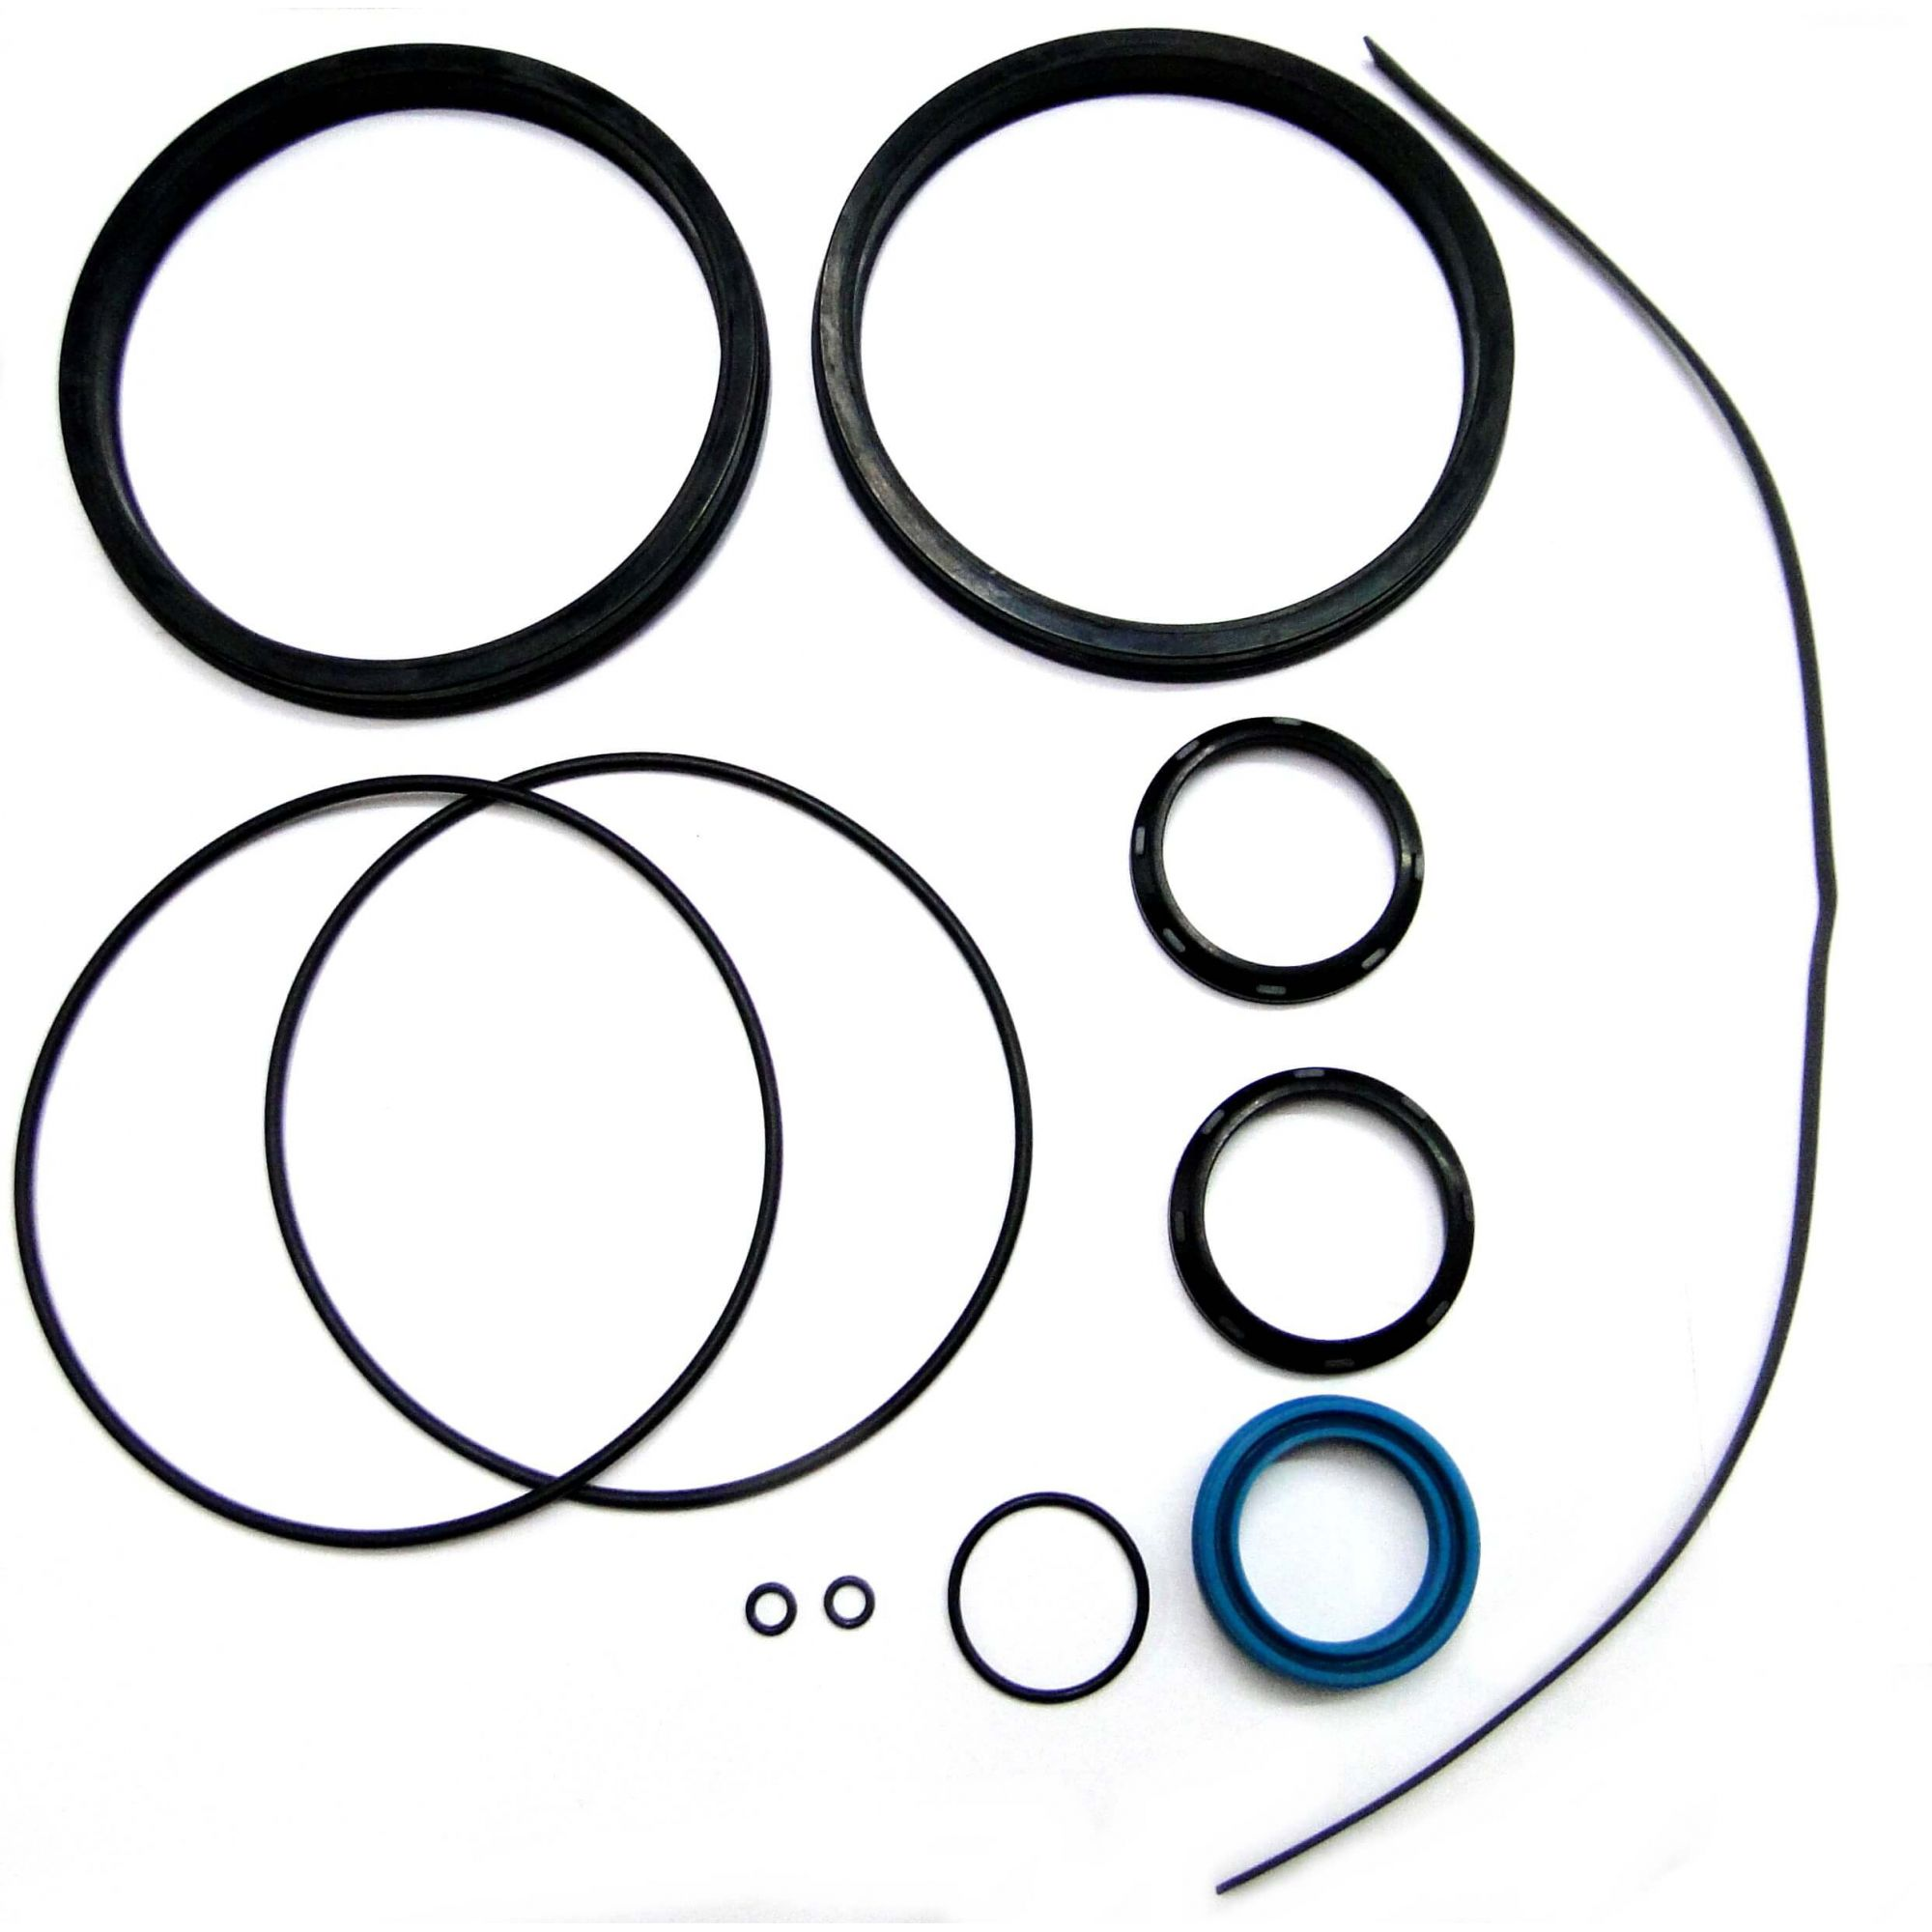 Kit Reparo para Cilindro Pneumático Haste Simples CWU125 Werk Schott